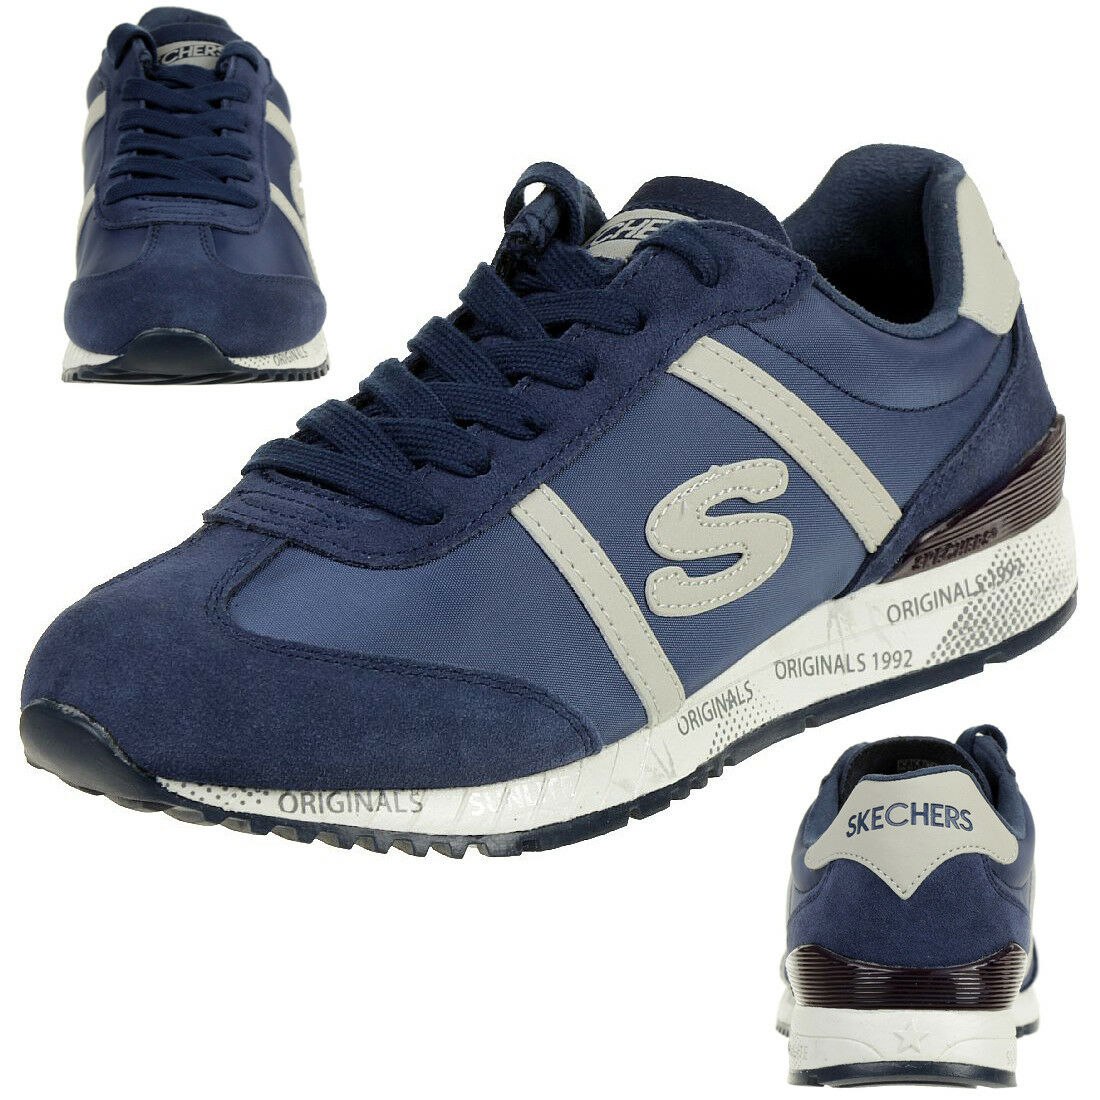 Skechers Originals 1992 SUNLITE reminise baskets Femmes Bleu 911 NVY